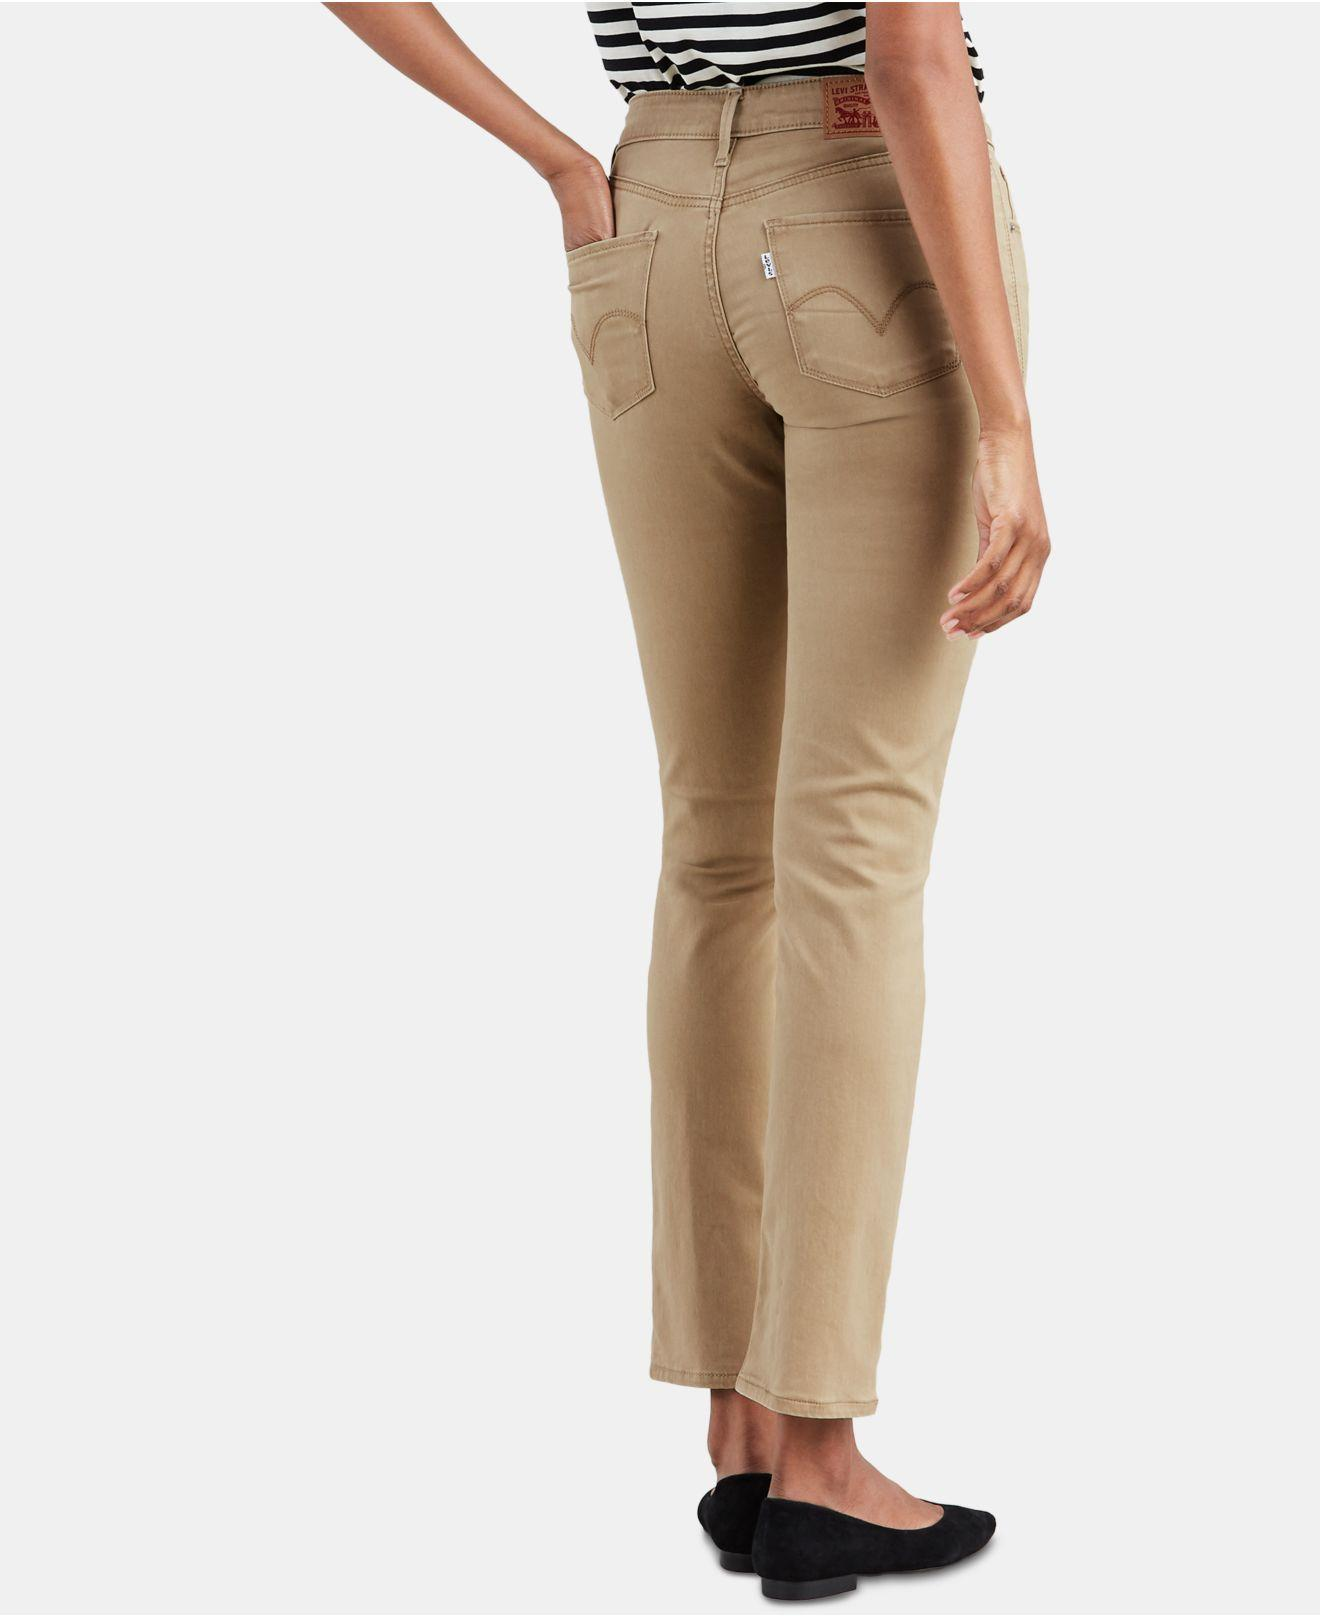 e168e4e69b0a Lyst - Levi's ® Mid-rise Skinny Jeans - Save 34%